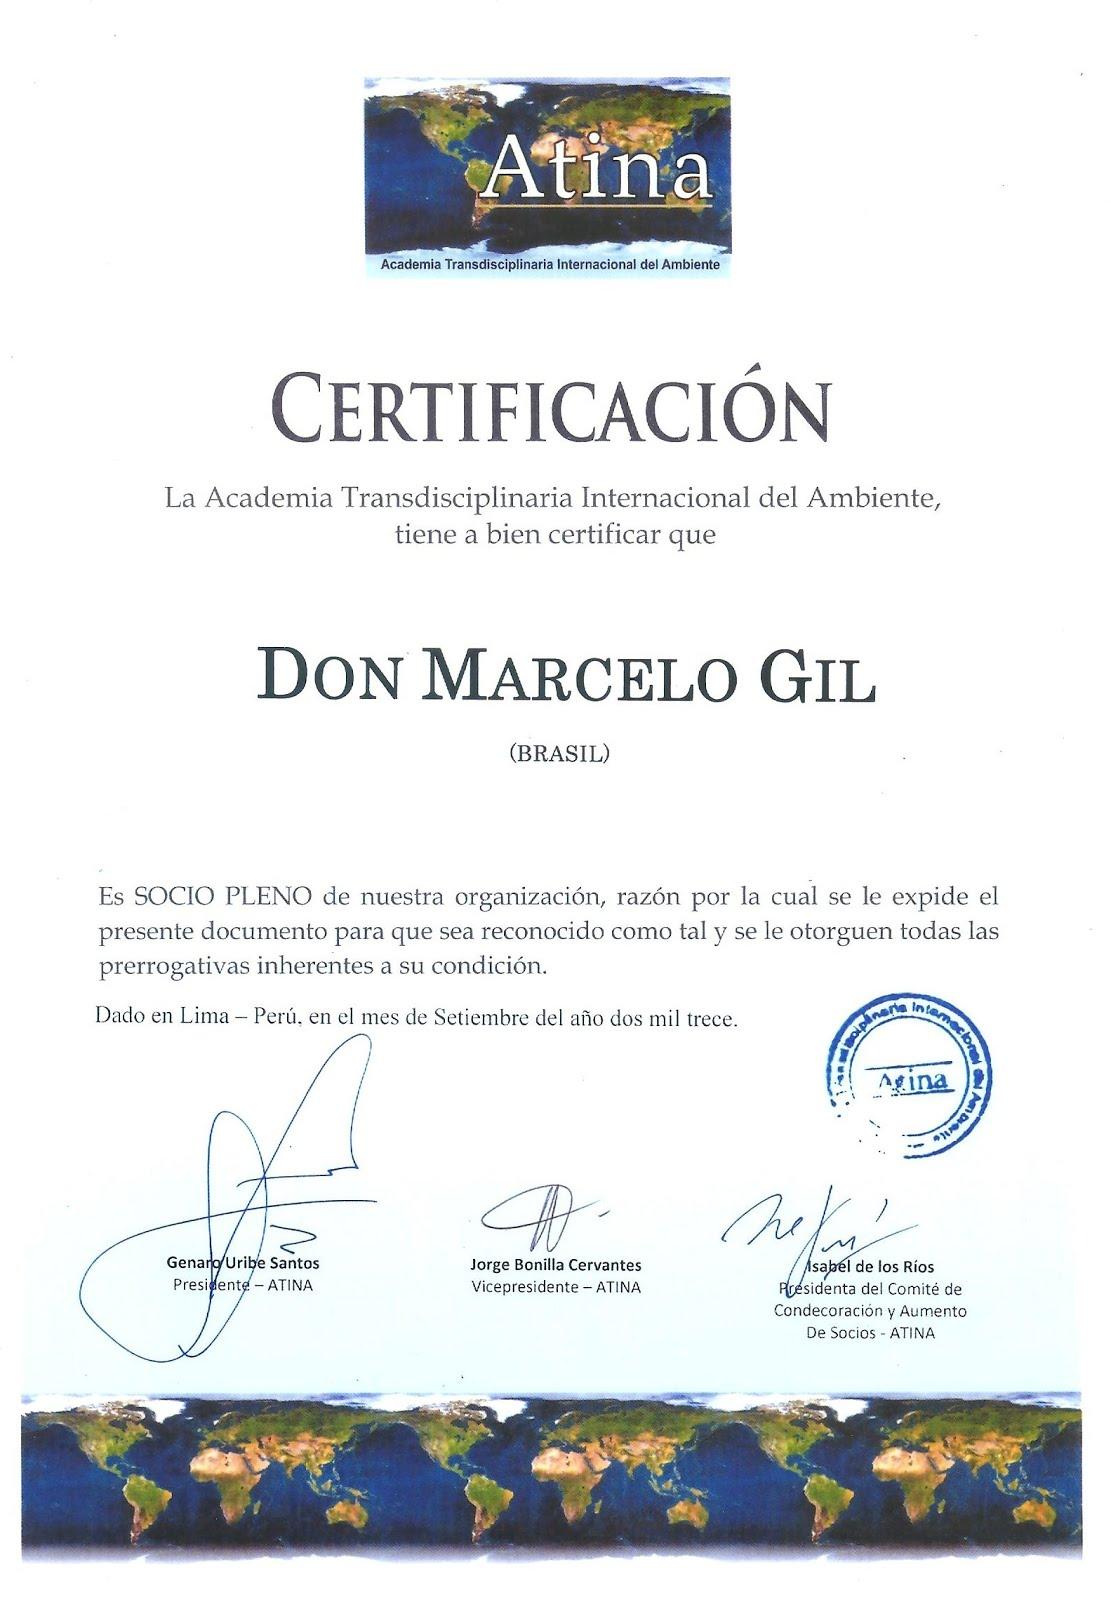 CERTIFICADO DE MEMBRO PLENO DA ATINA CONCEDIDO À MARCELO GIL.